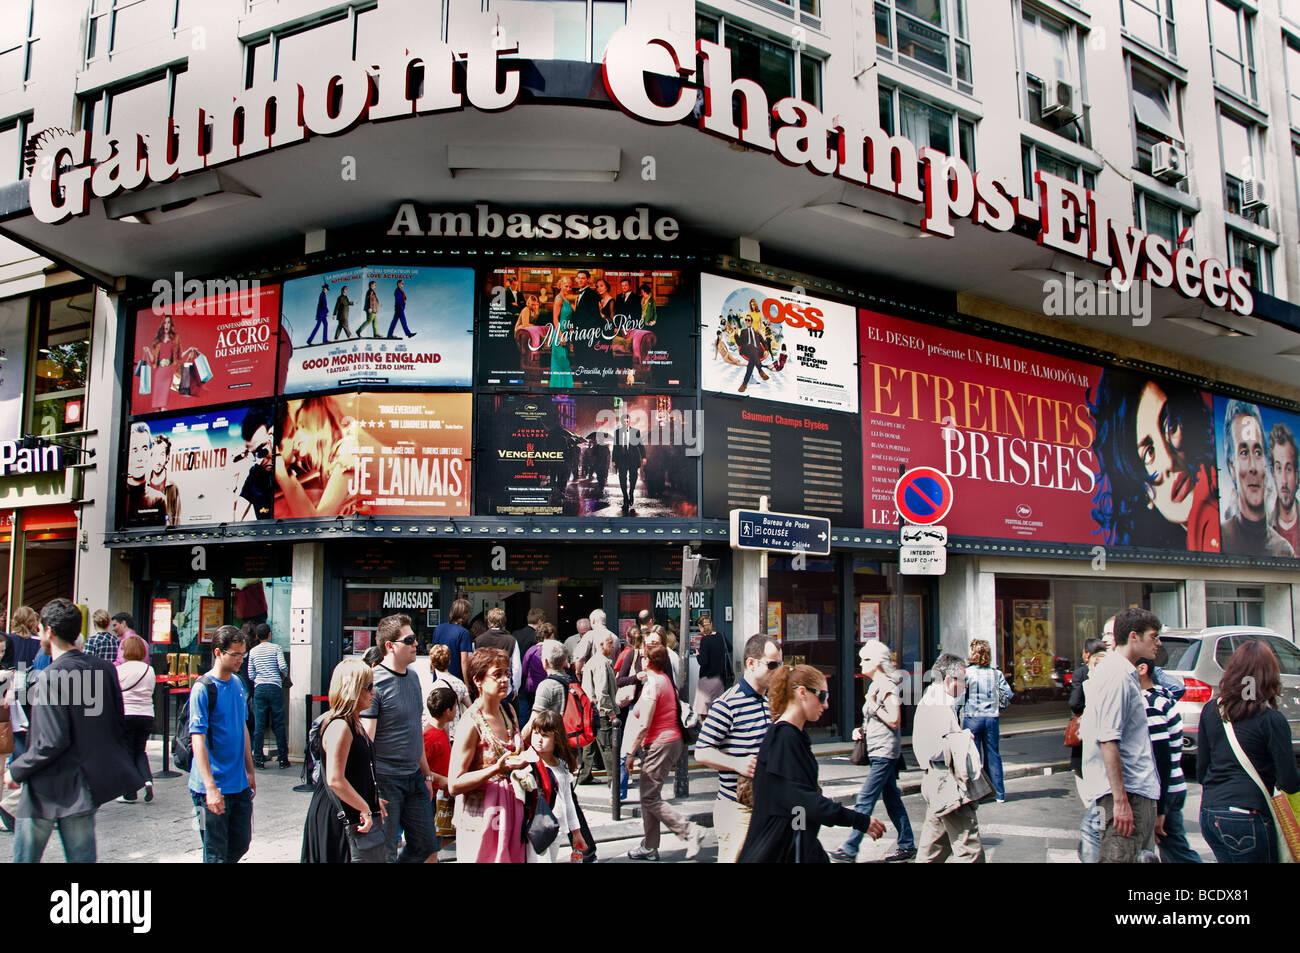 Anenue Des Champs Elysees Paris Kino Filme Kino Bilder Stockbild